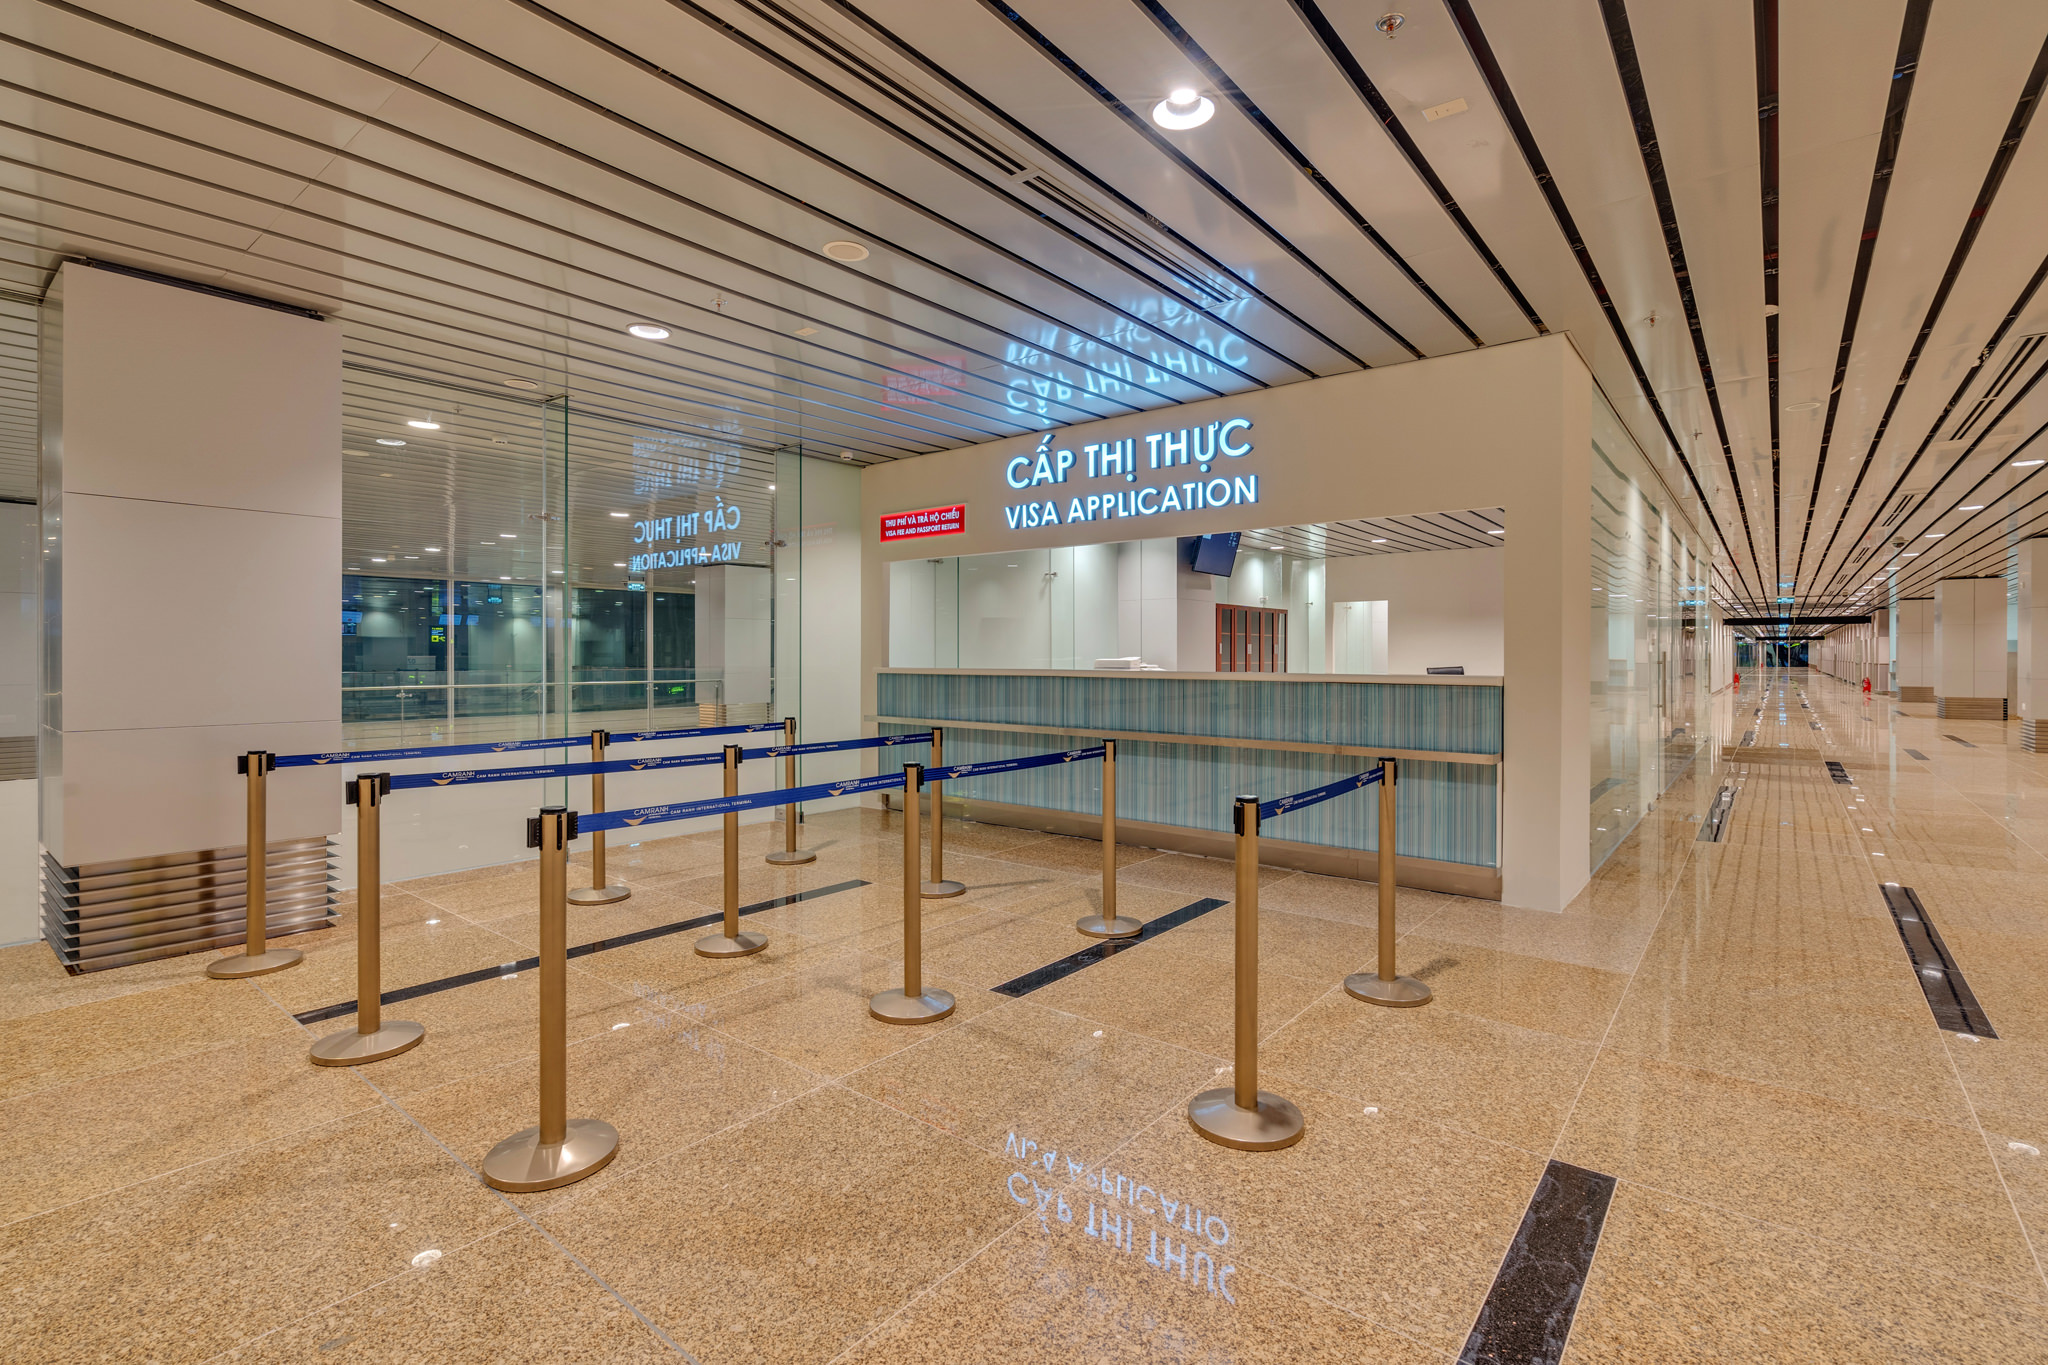 20180626 - Cam Ranh Airport - Architecture - 0417.jpg